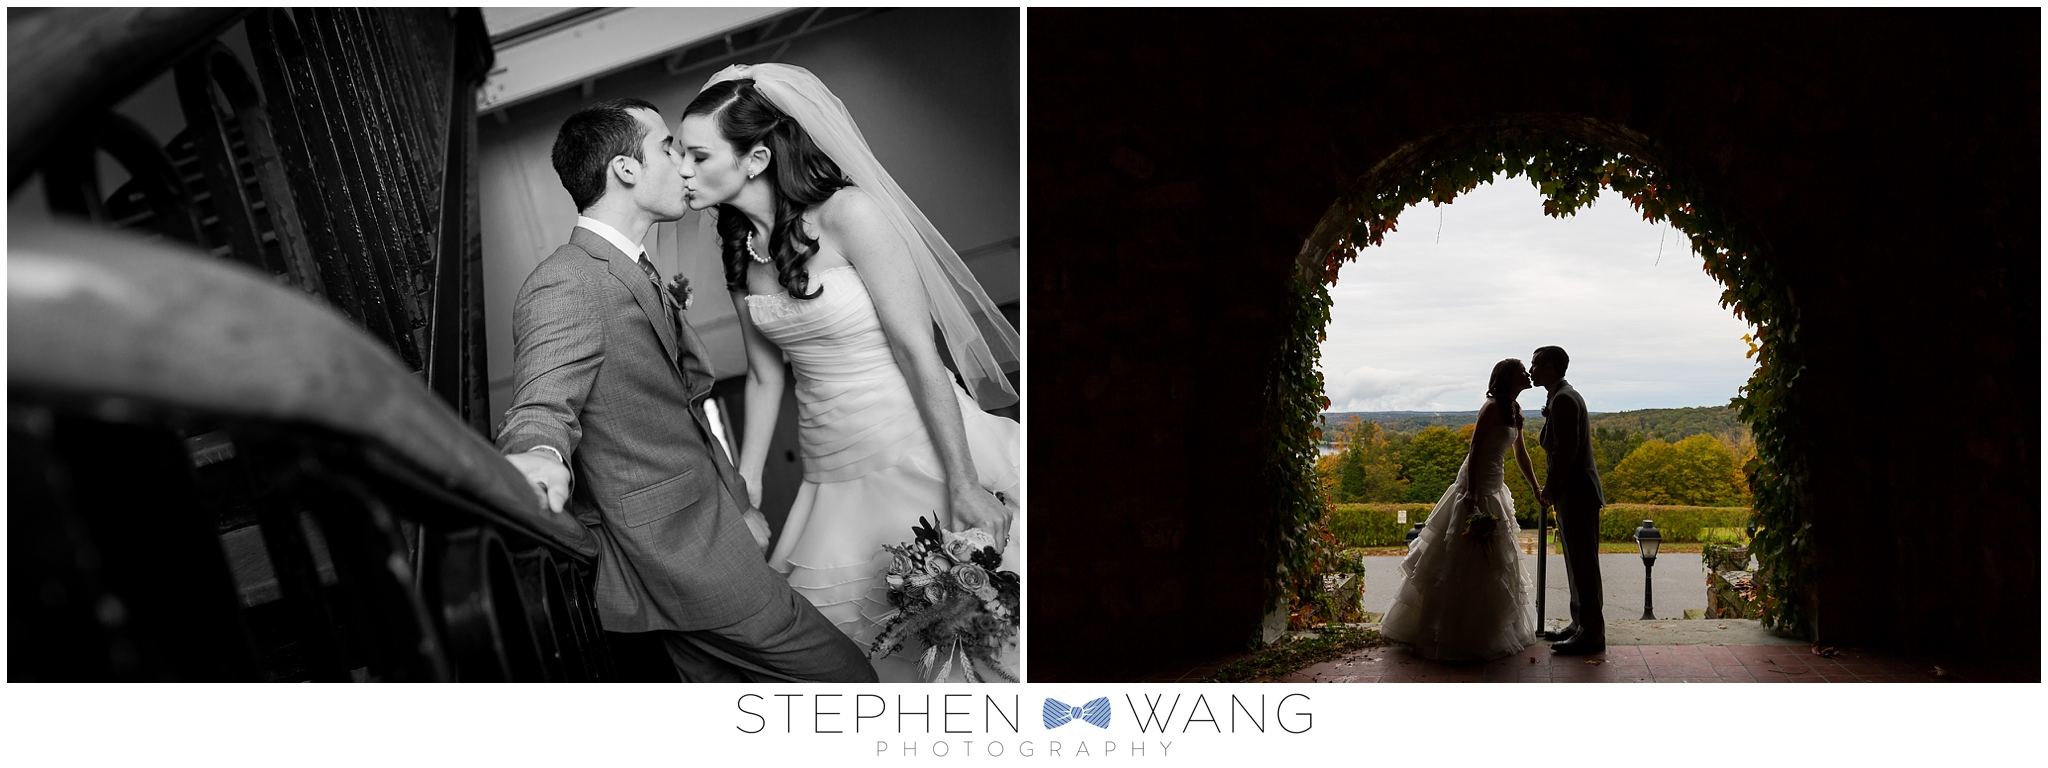 Stephen Wang Photography wedding connecticut deep river lace factory wedding photography connecticut photographer-01-22_0012.jpg